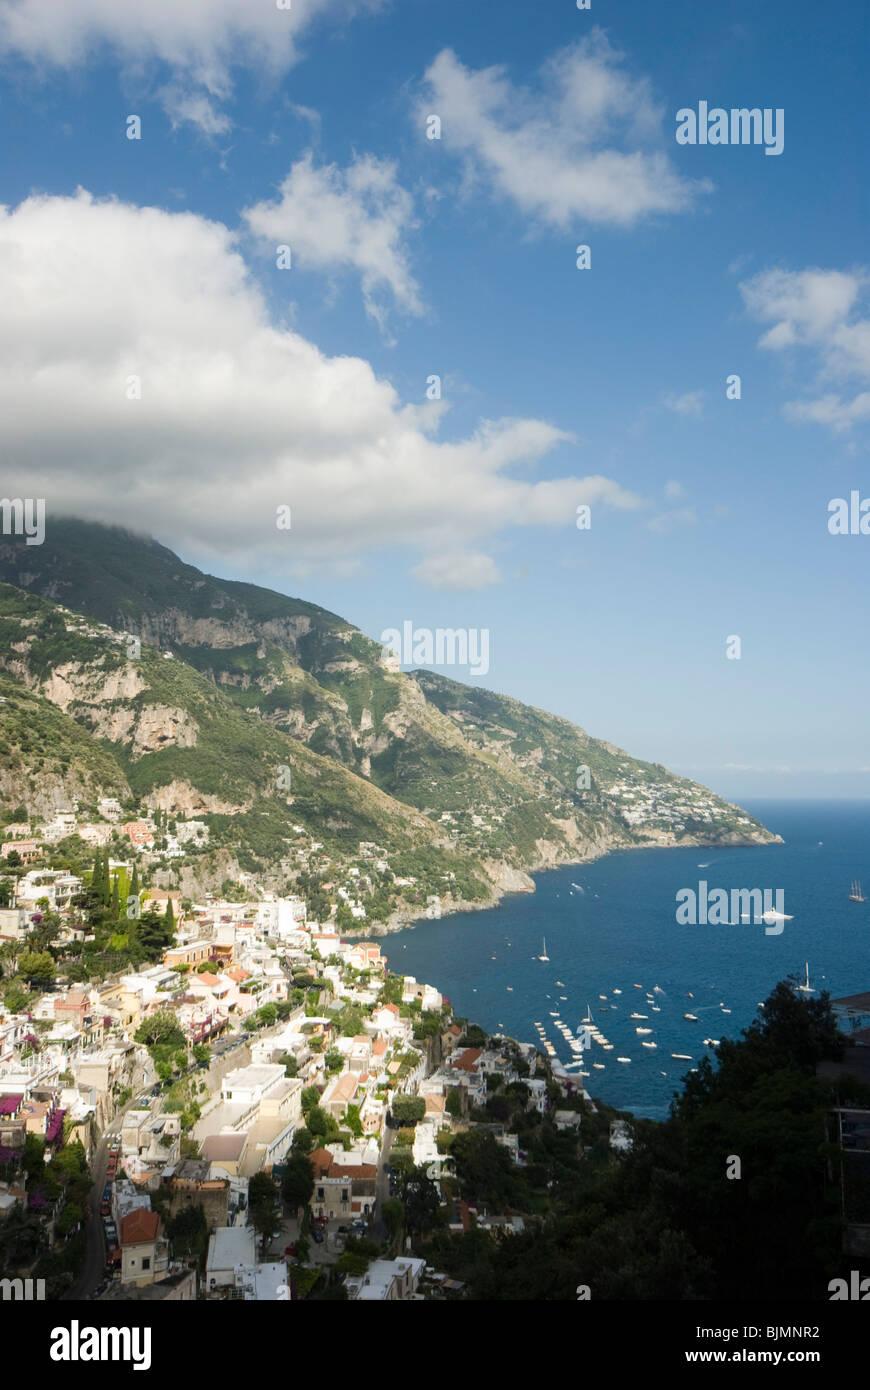 Italien, Kampanien, Amalfiküste, Positano | Italy, Campania, Amalfi Coast, Positano - Stock Image